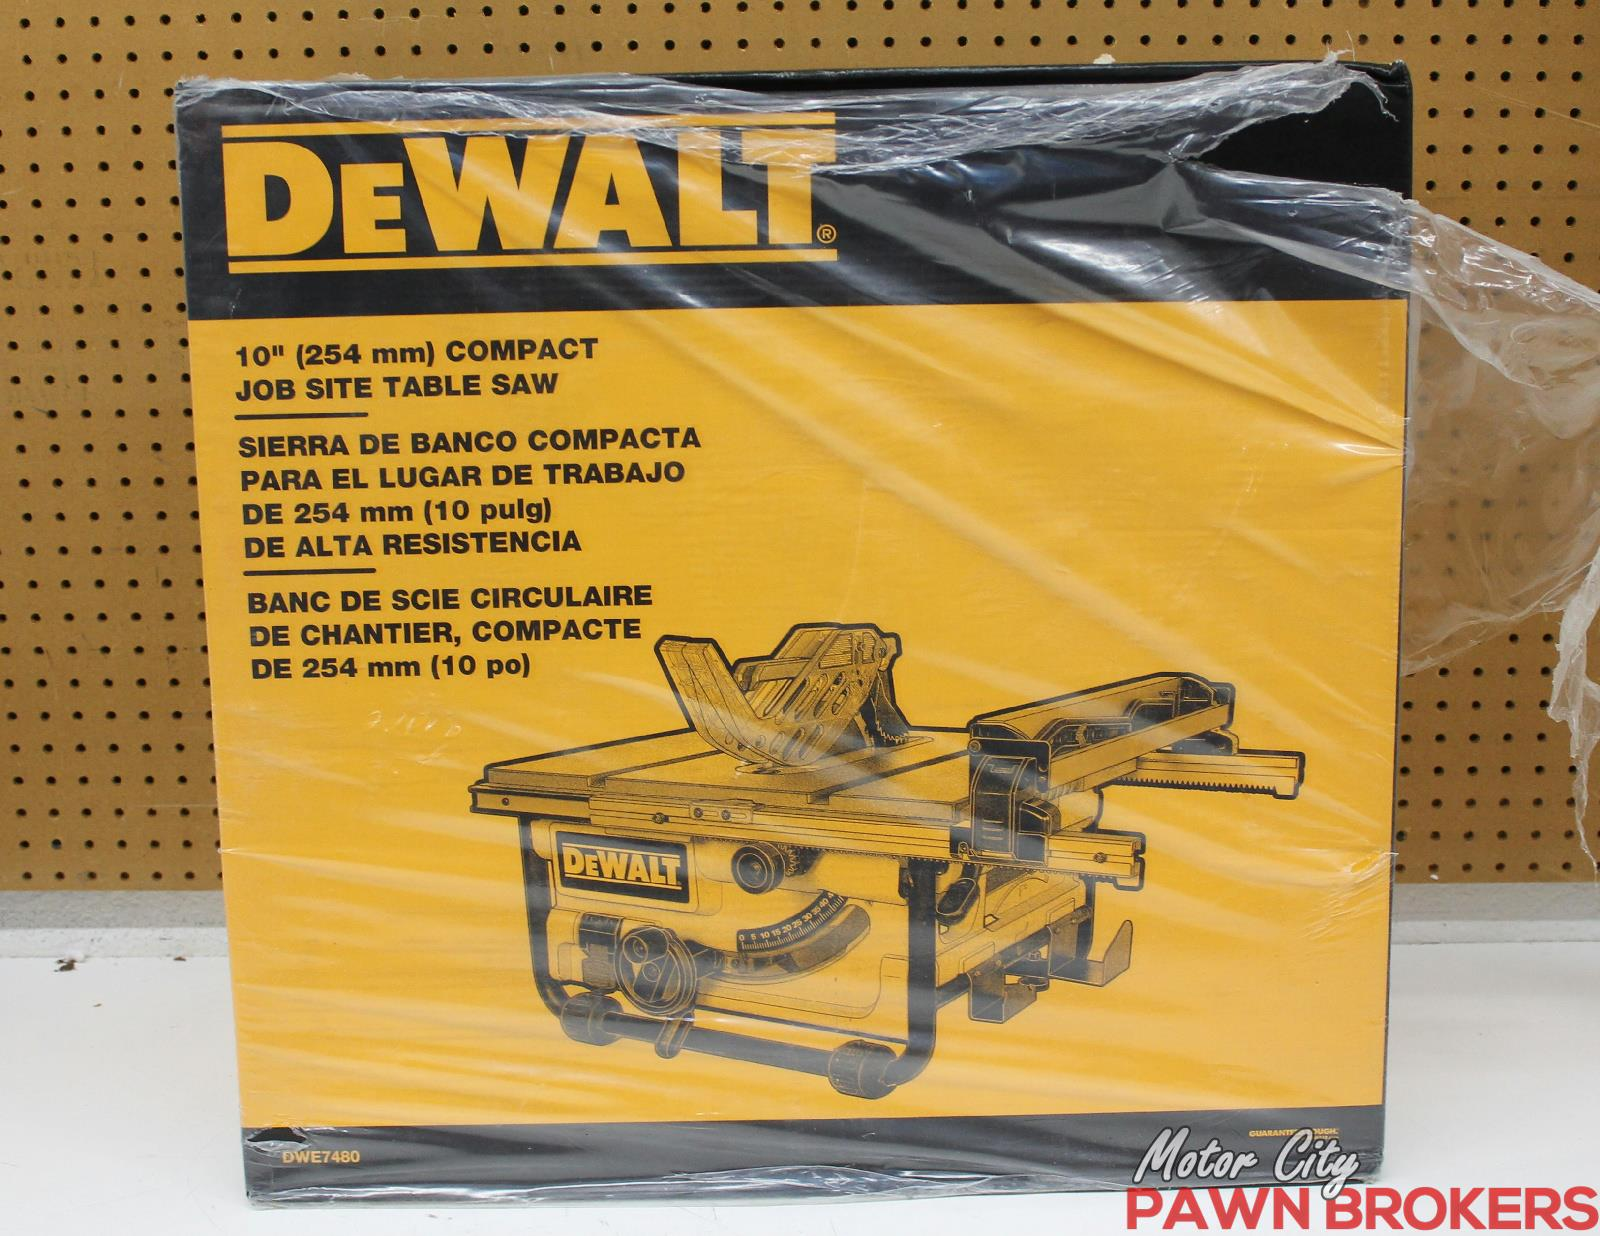 Dewalt Dwe7480 10 Compact Job Site Table Saw Brand New Ebay